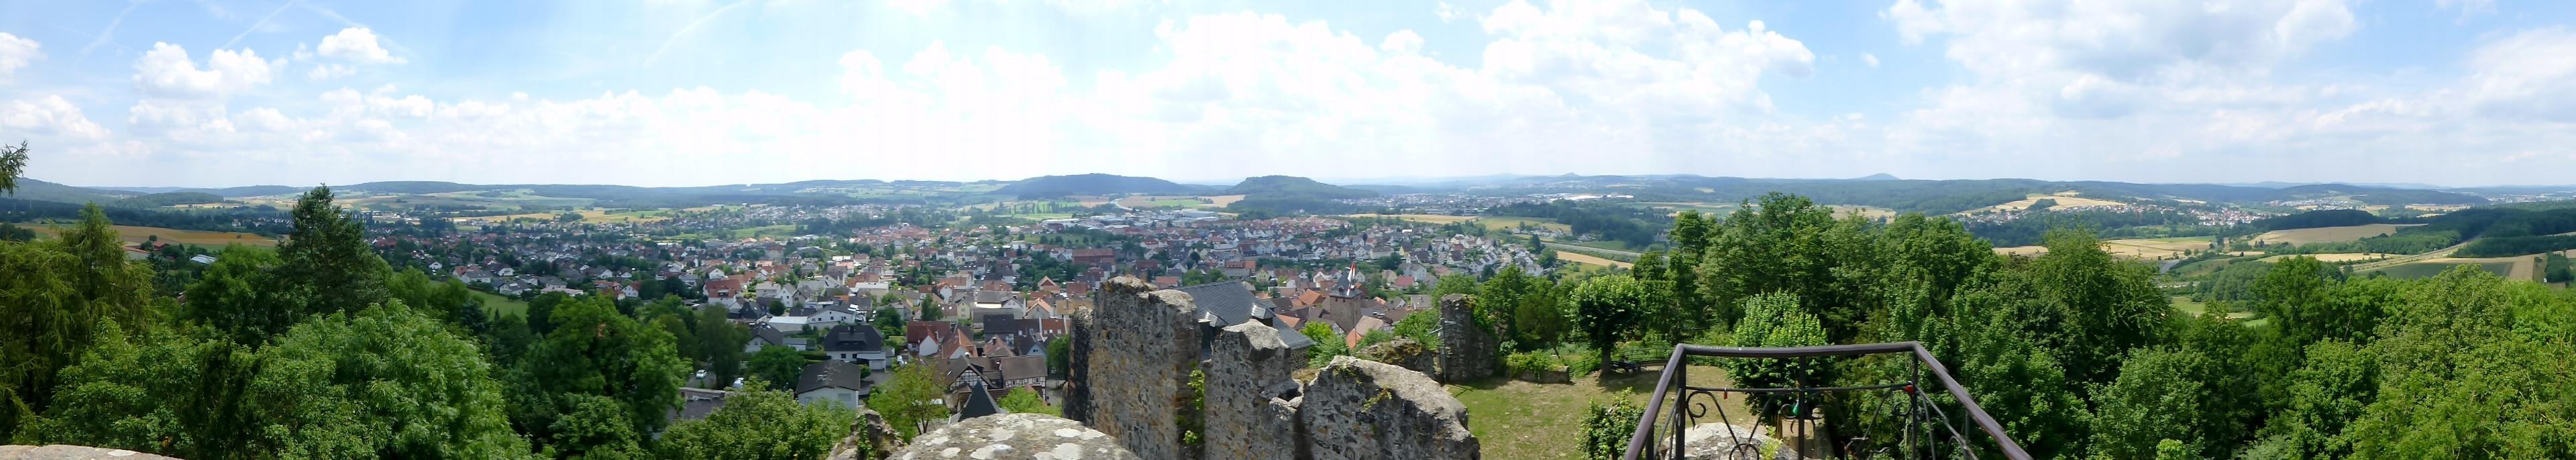 Giessen District, Hessen, Germany